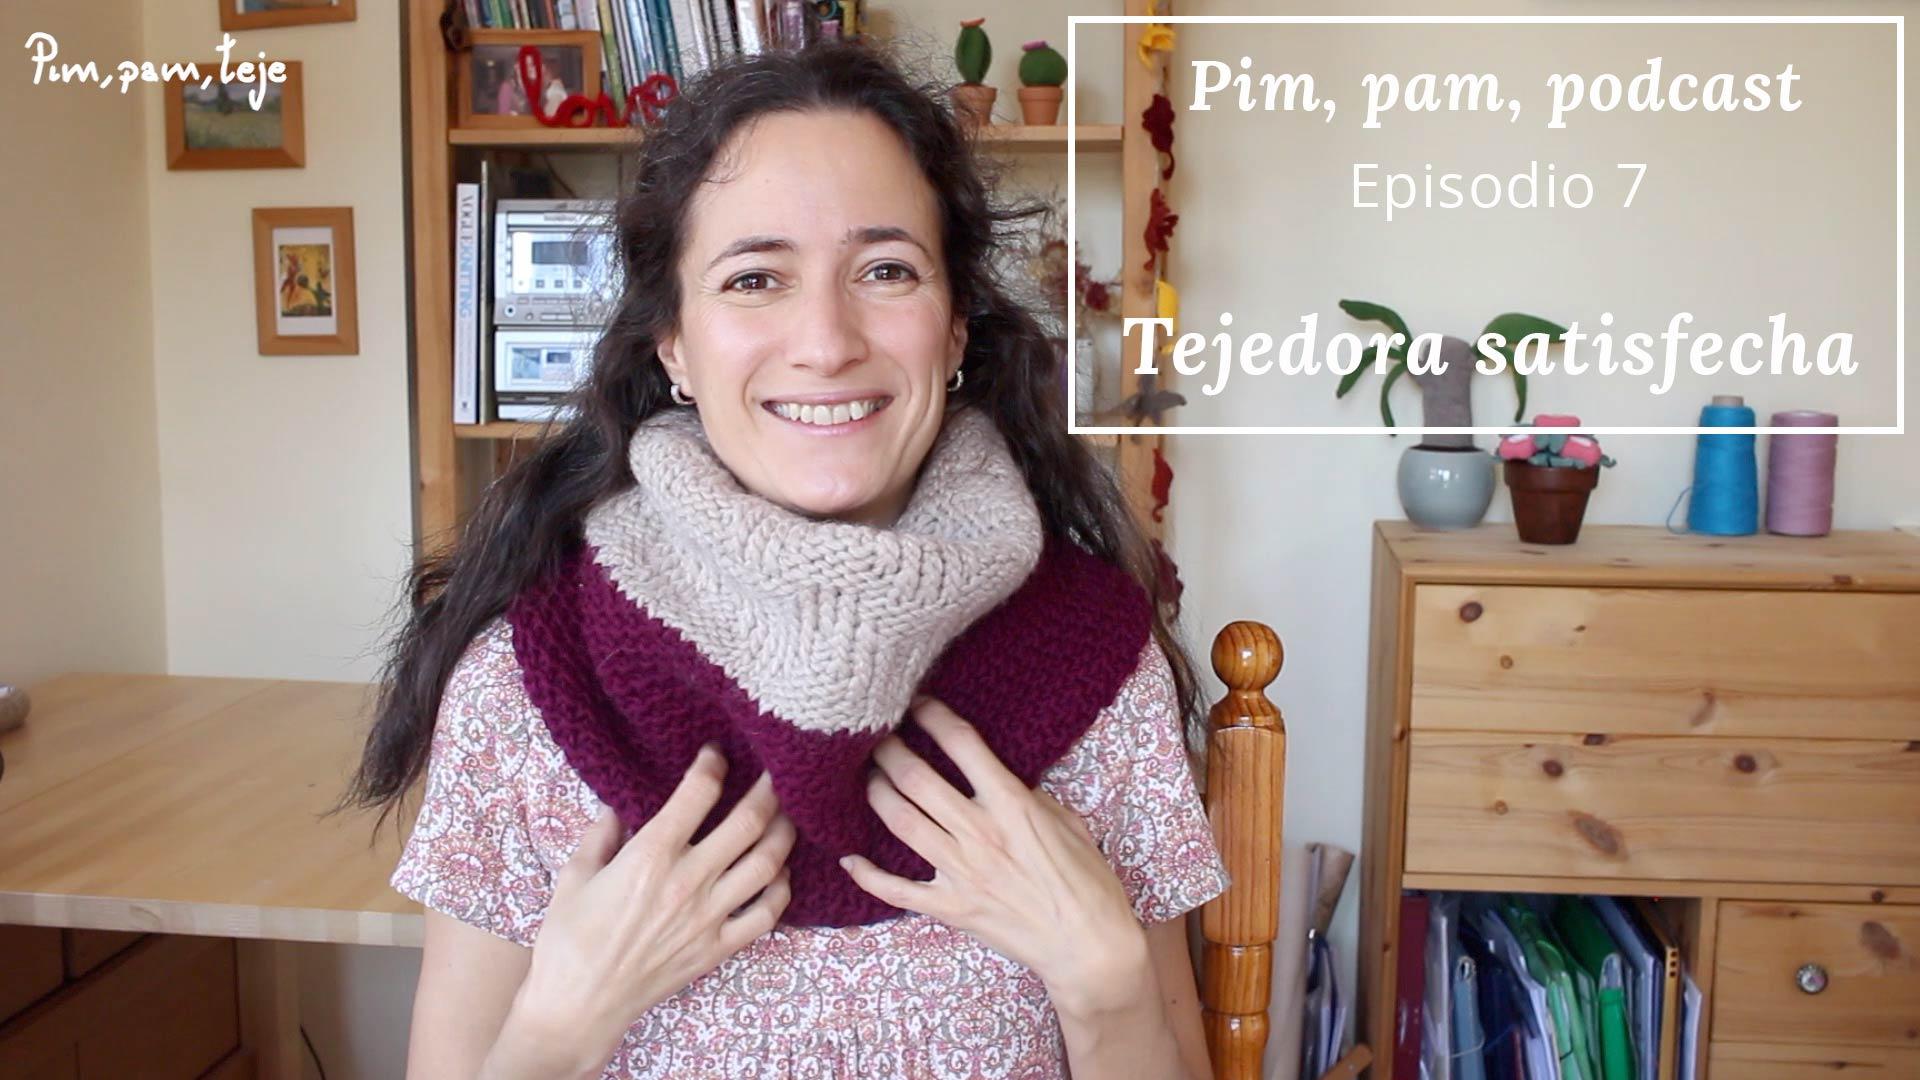 Episodio 7 del Pim, Pam, Podcast, un podcast de tejido en español